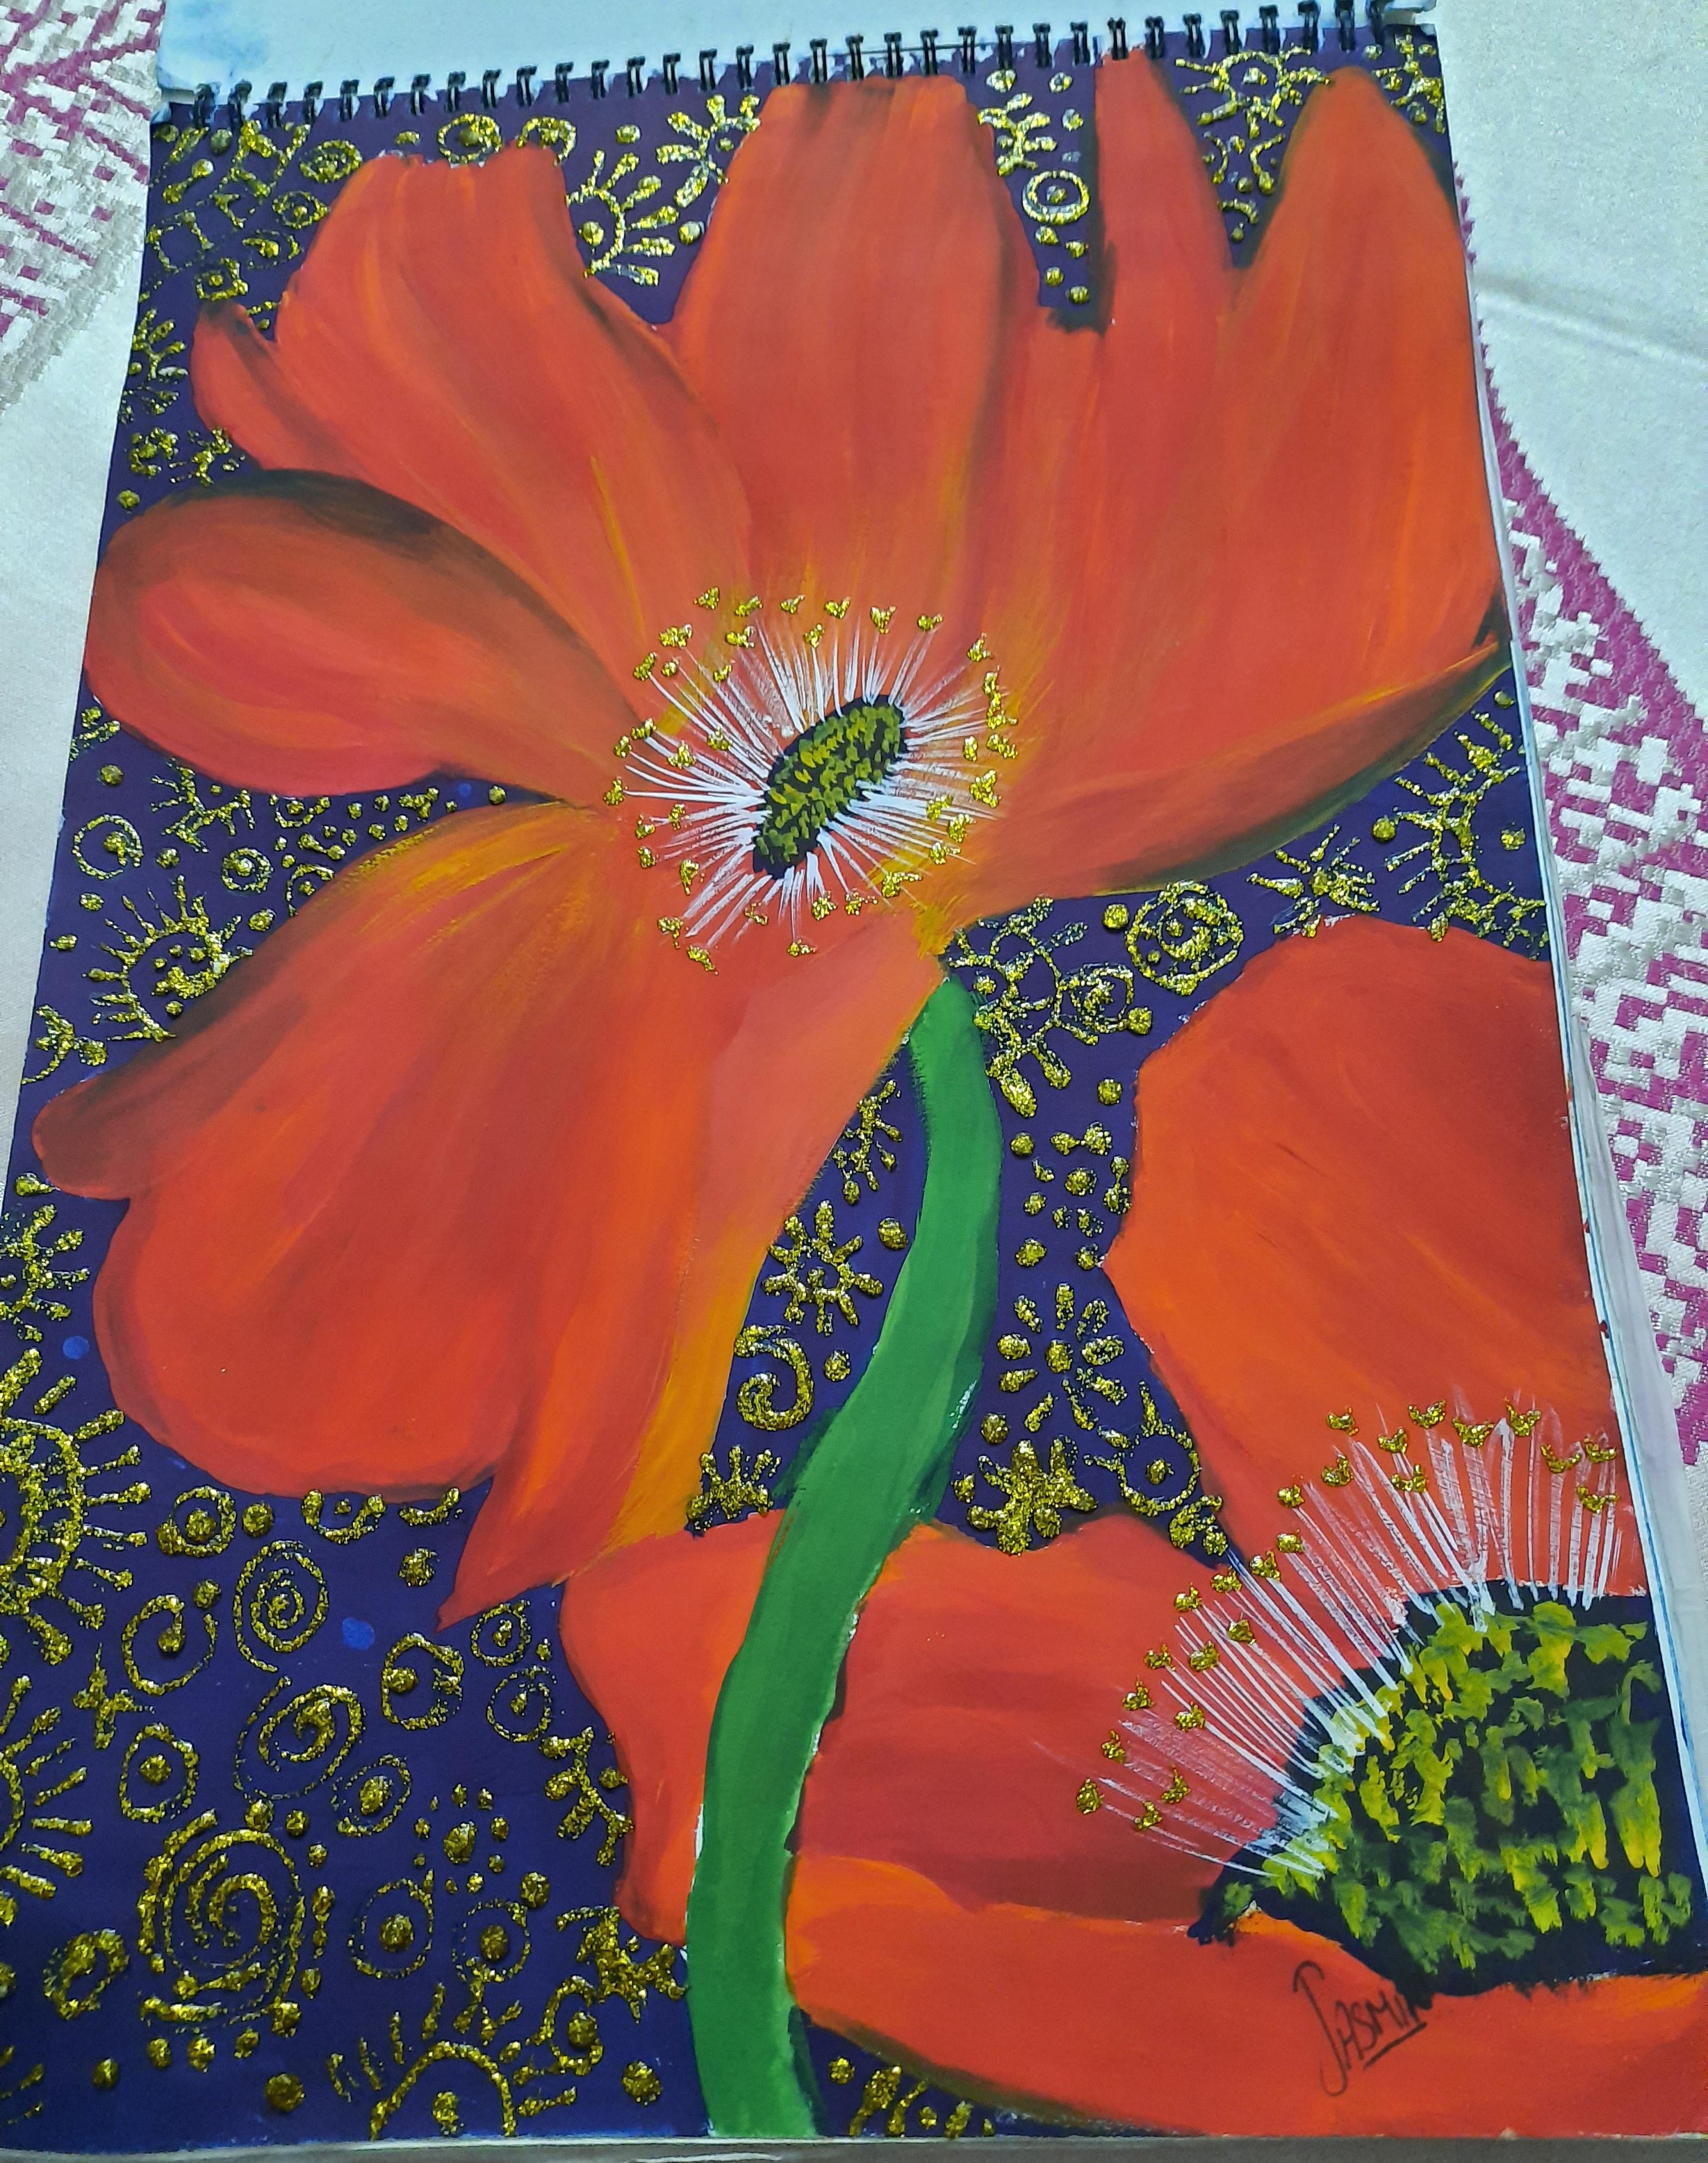 Jasmin's Flower Painting